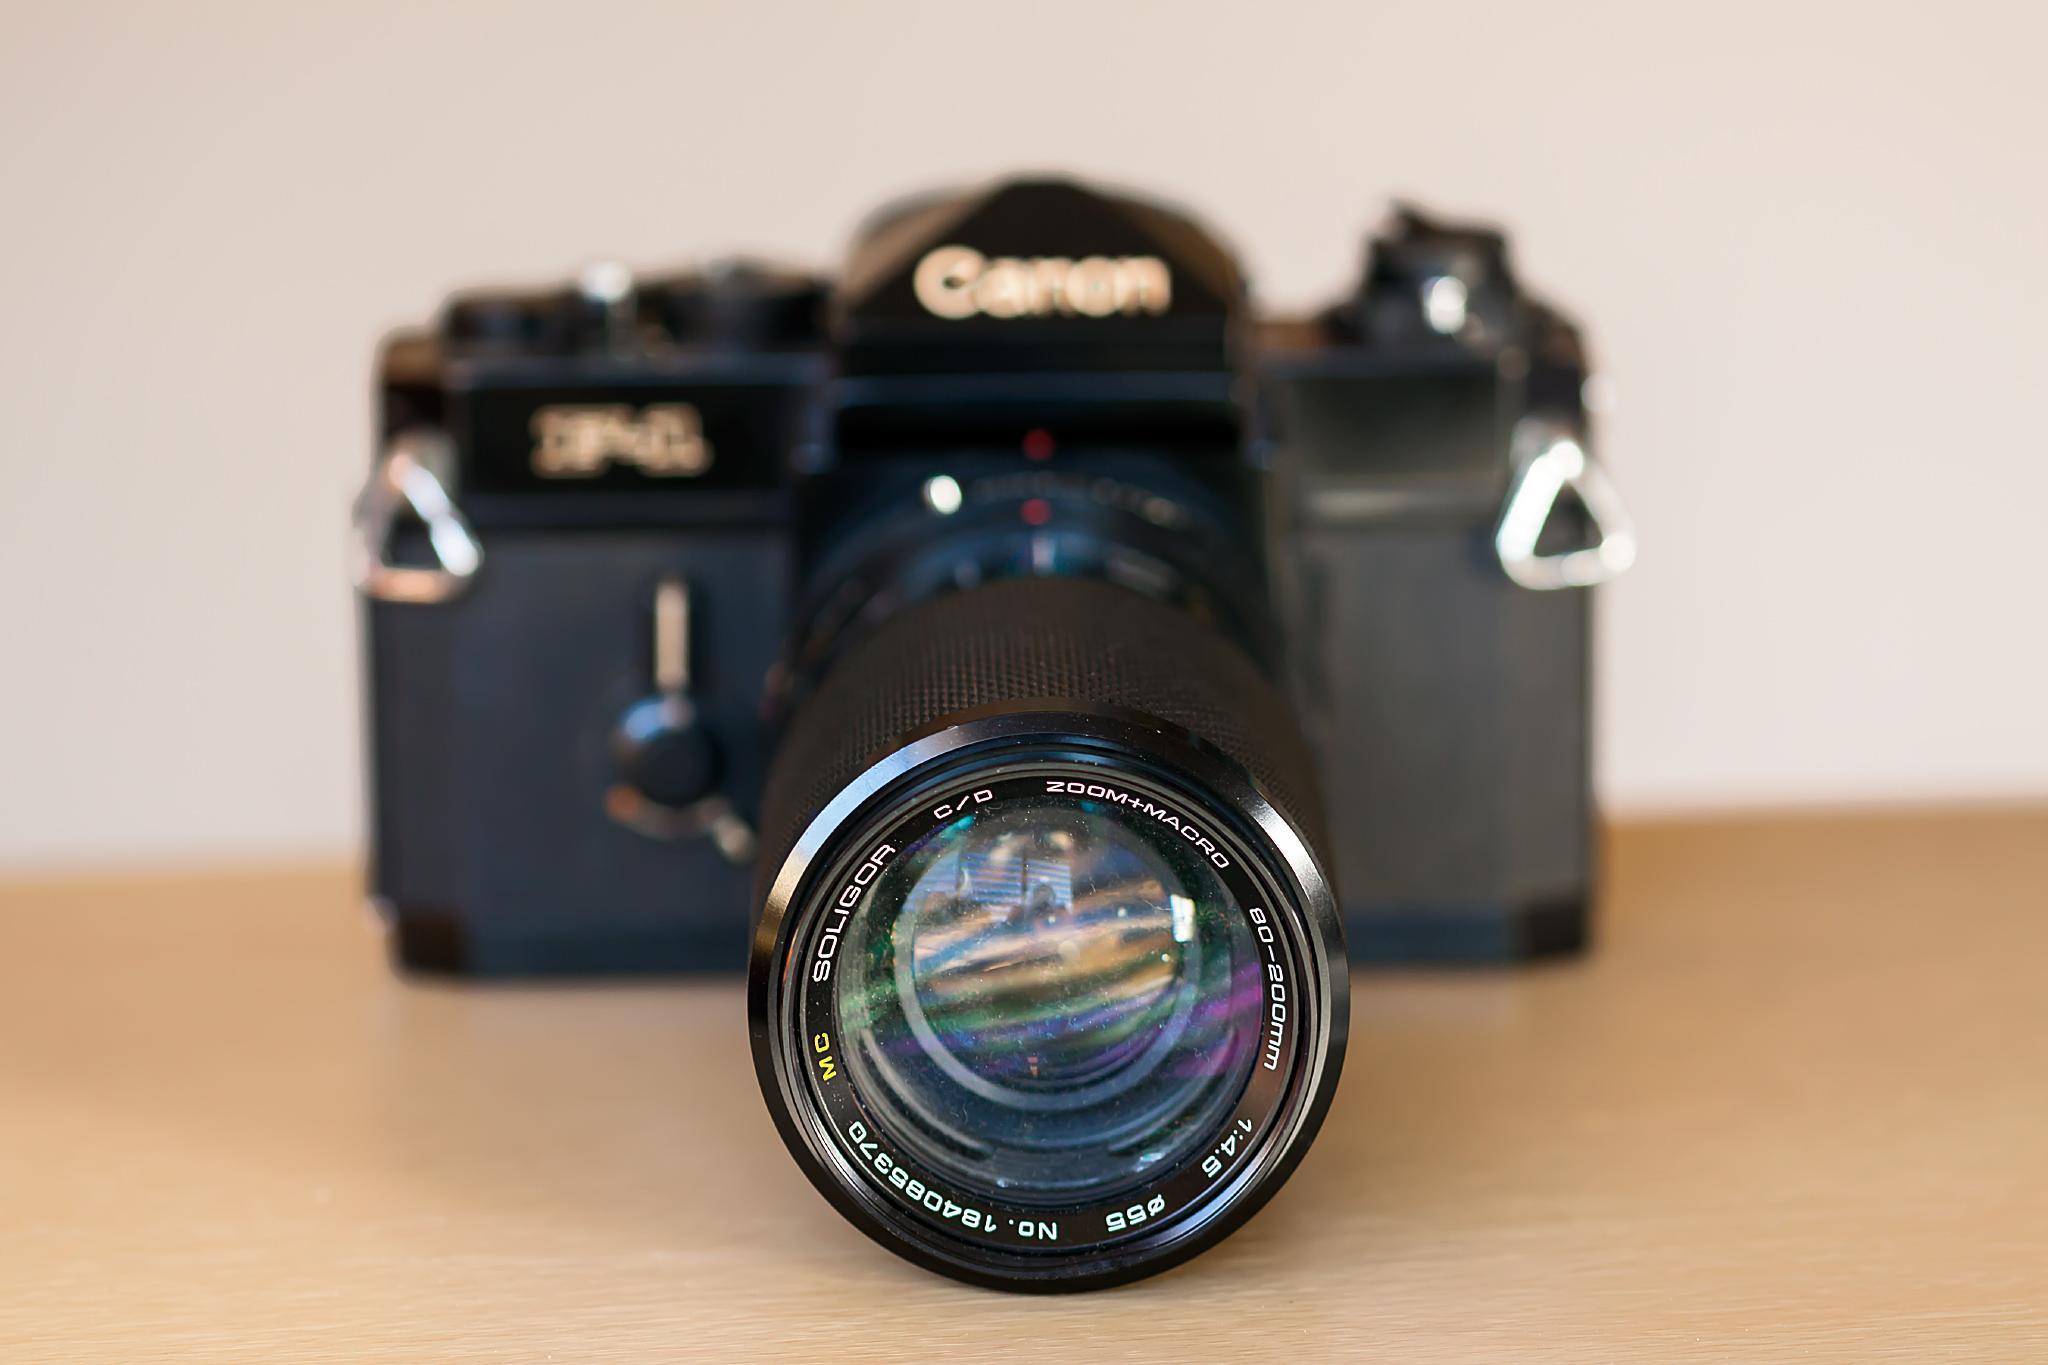 Canon F1 by Tony Guzman